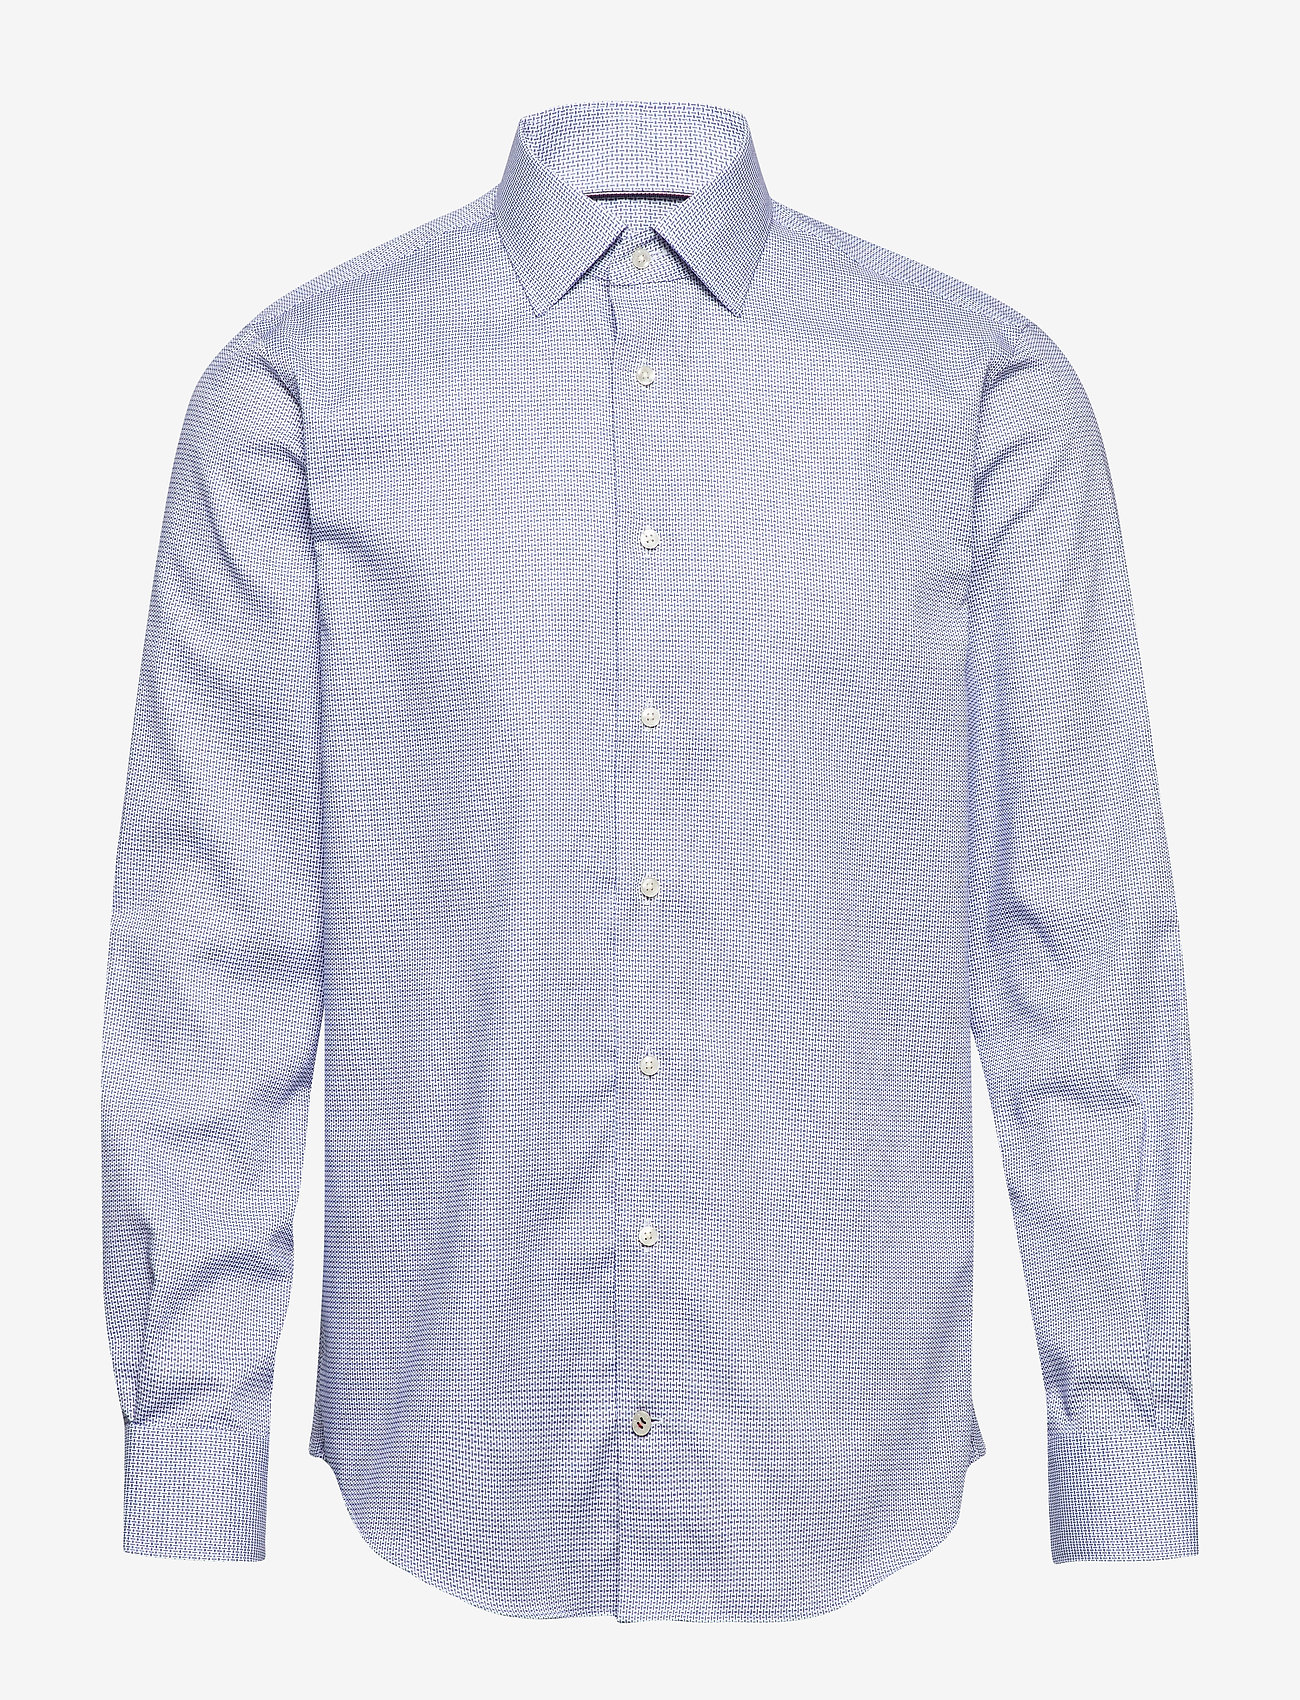 Tommy Hilfiger Tailored - DOBBY DESIGN CLASSIC SHIRT - basic skjorter - navy/white - 0